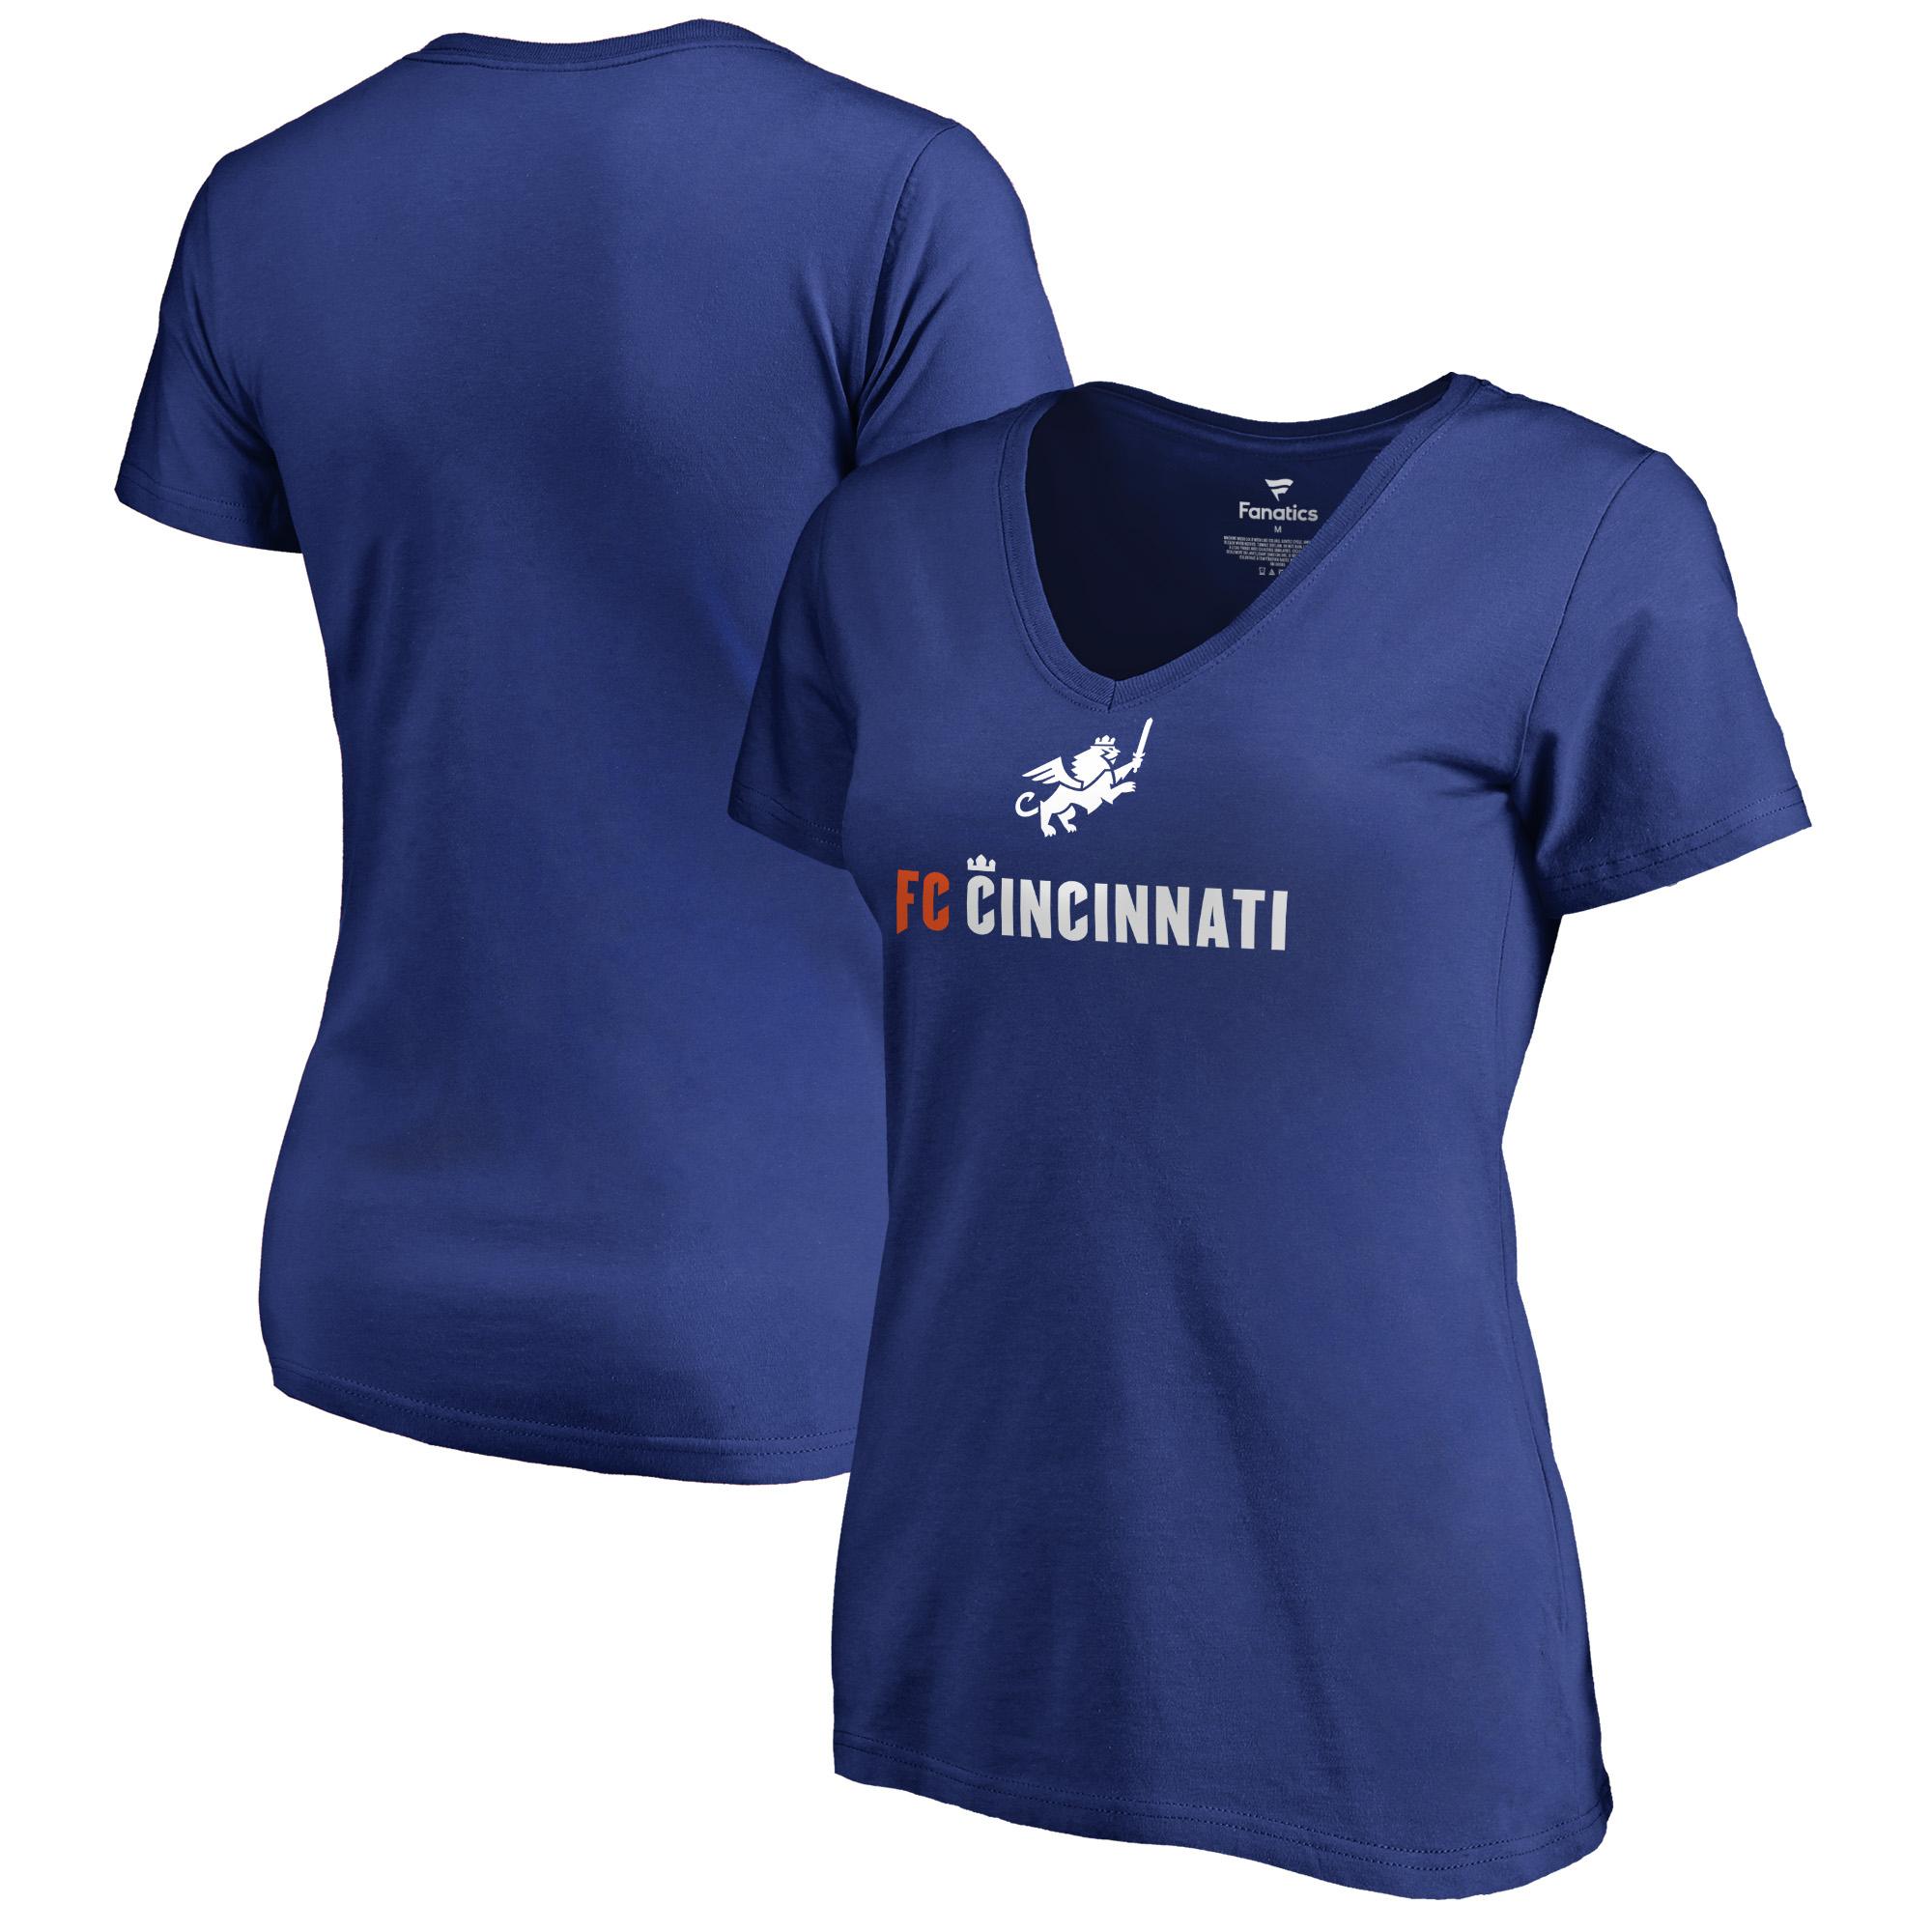 FC Cincinnati Fanatics Branded Women's Victory Arch Plus Size V-Neck T-Shirt - Royal